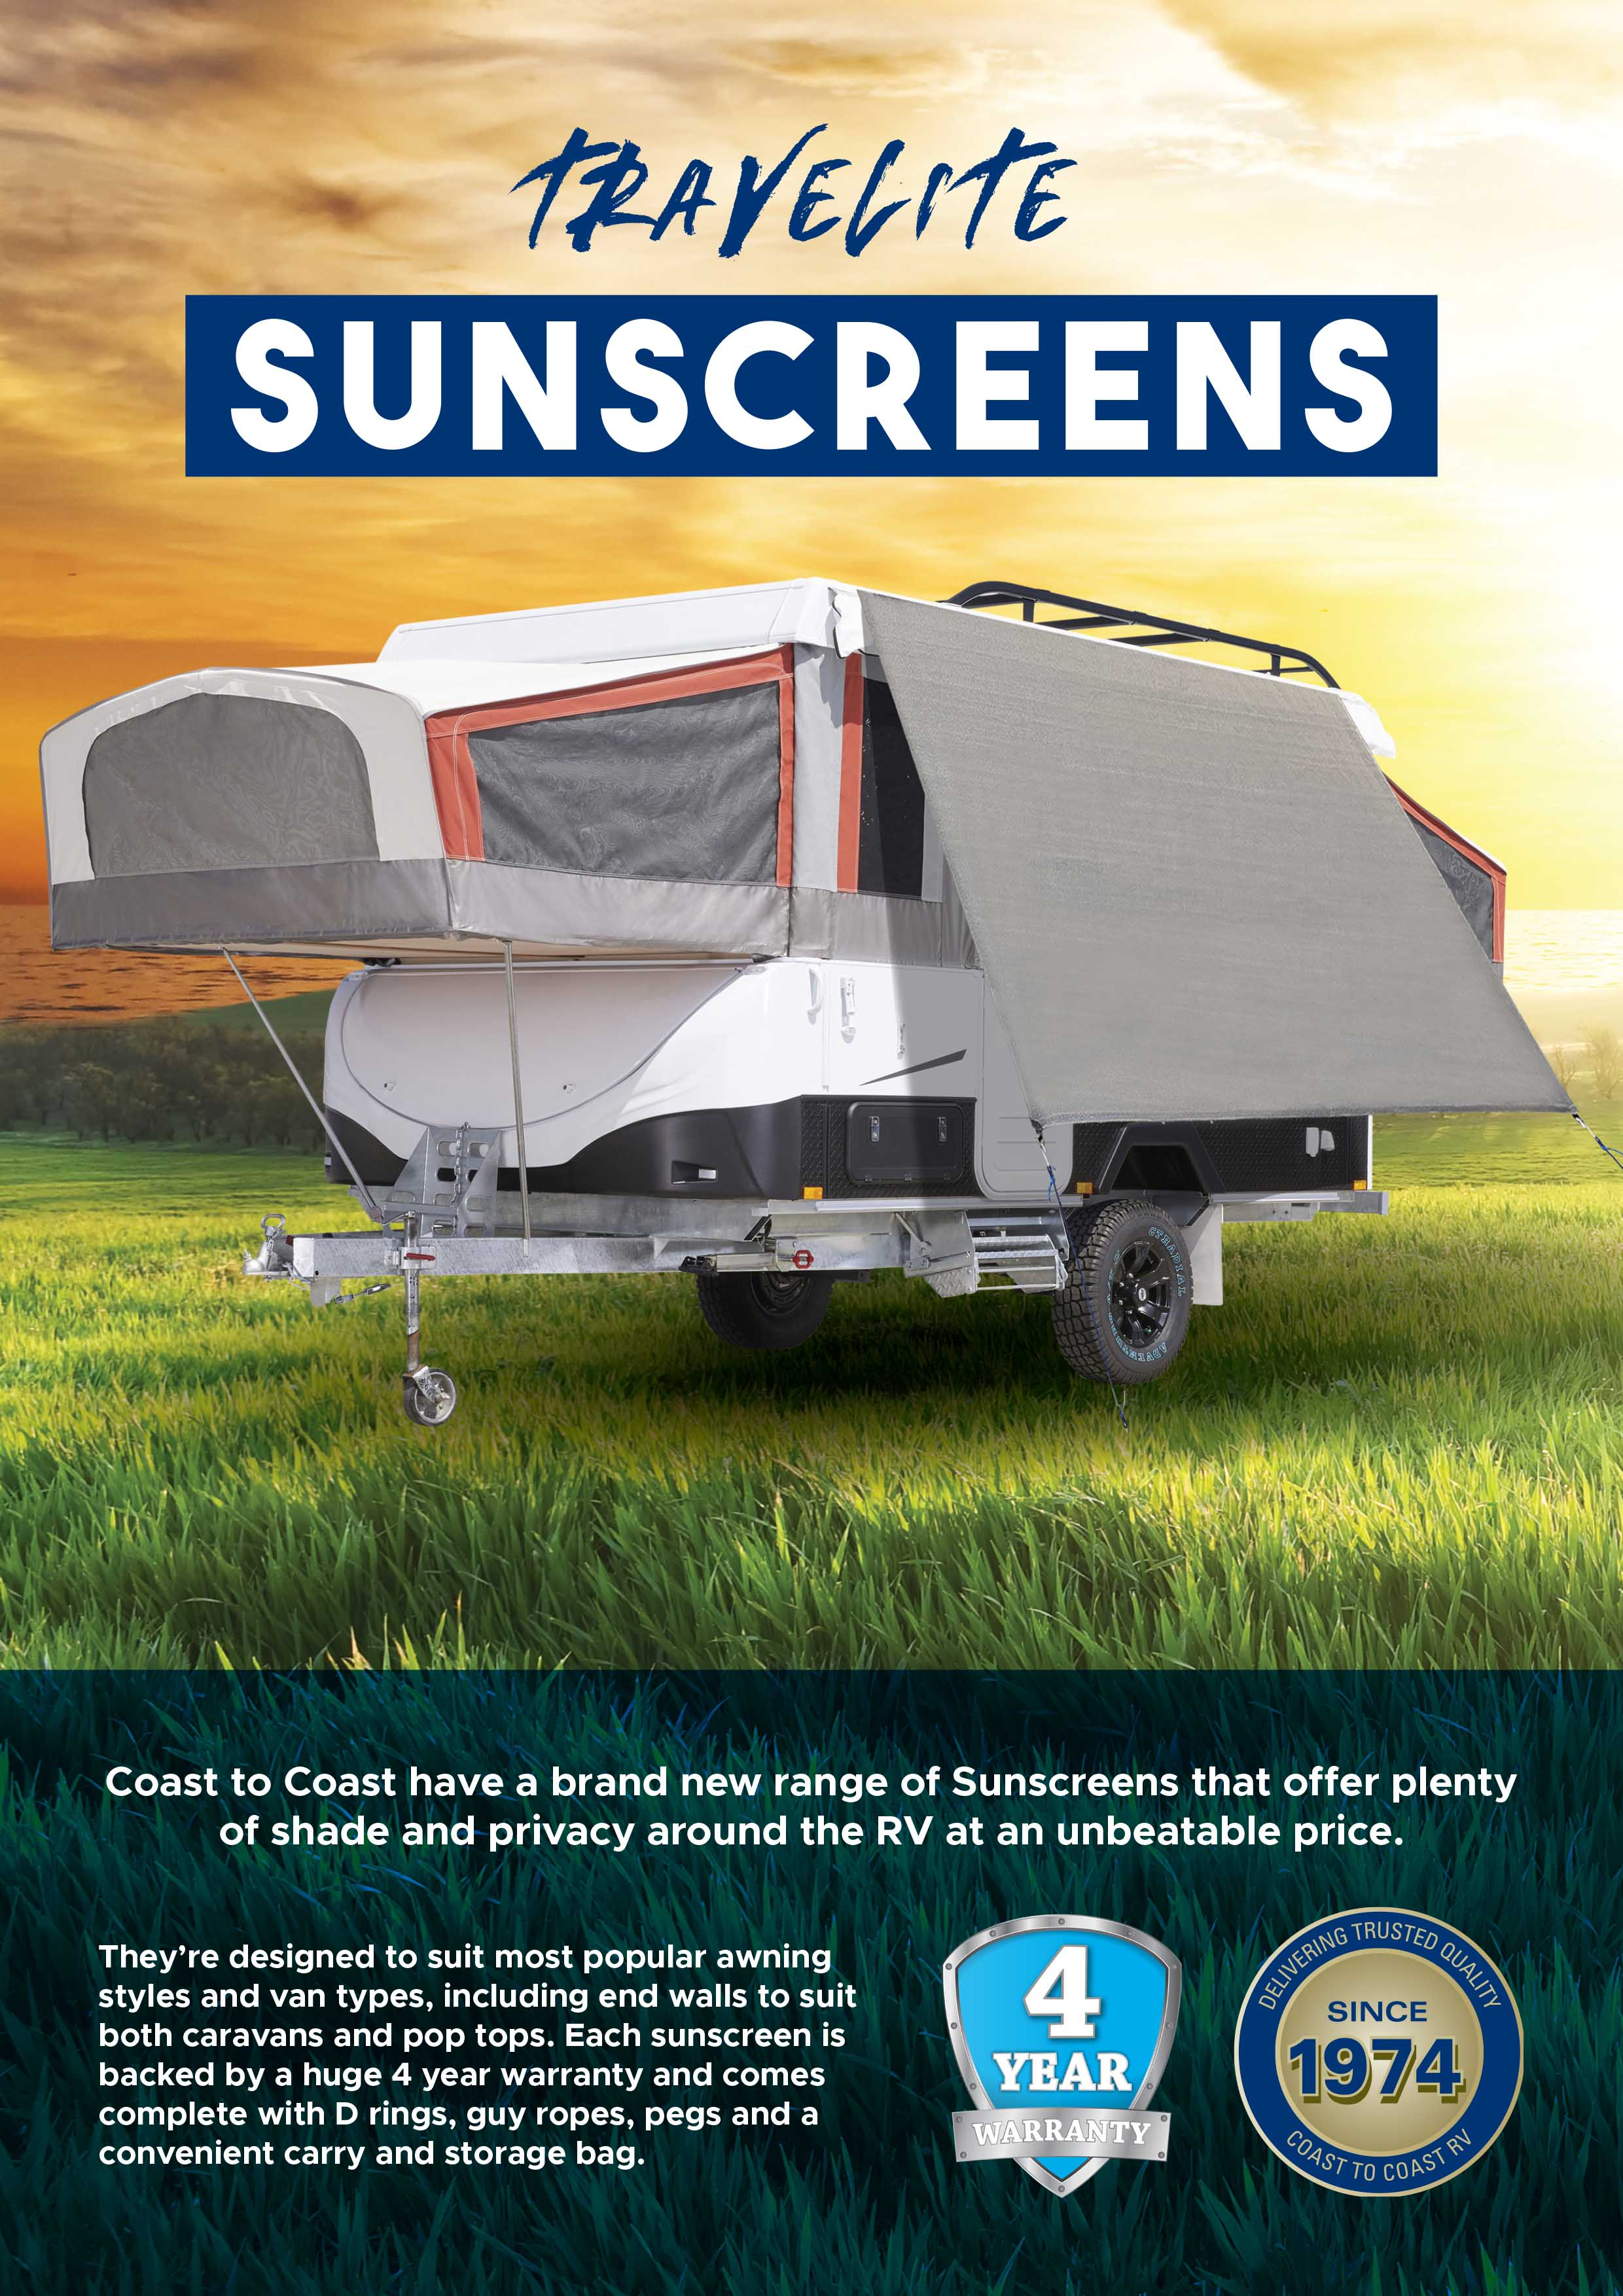 Travelite Sunscreens